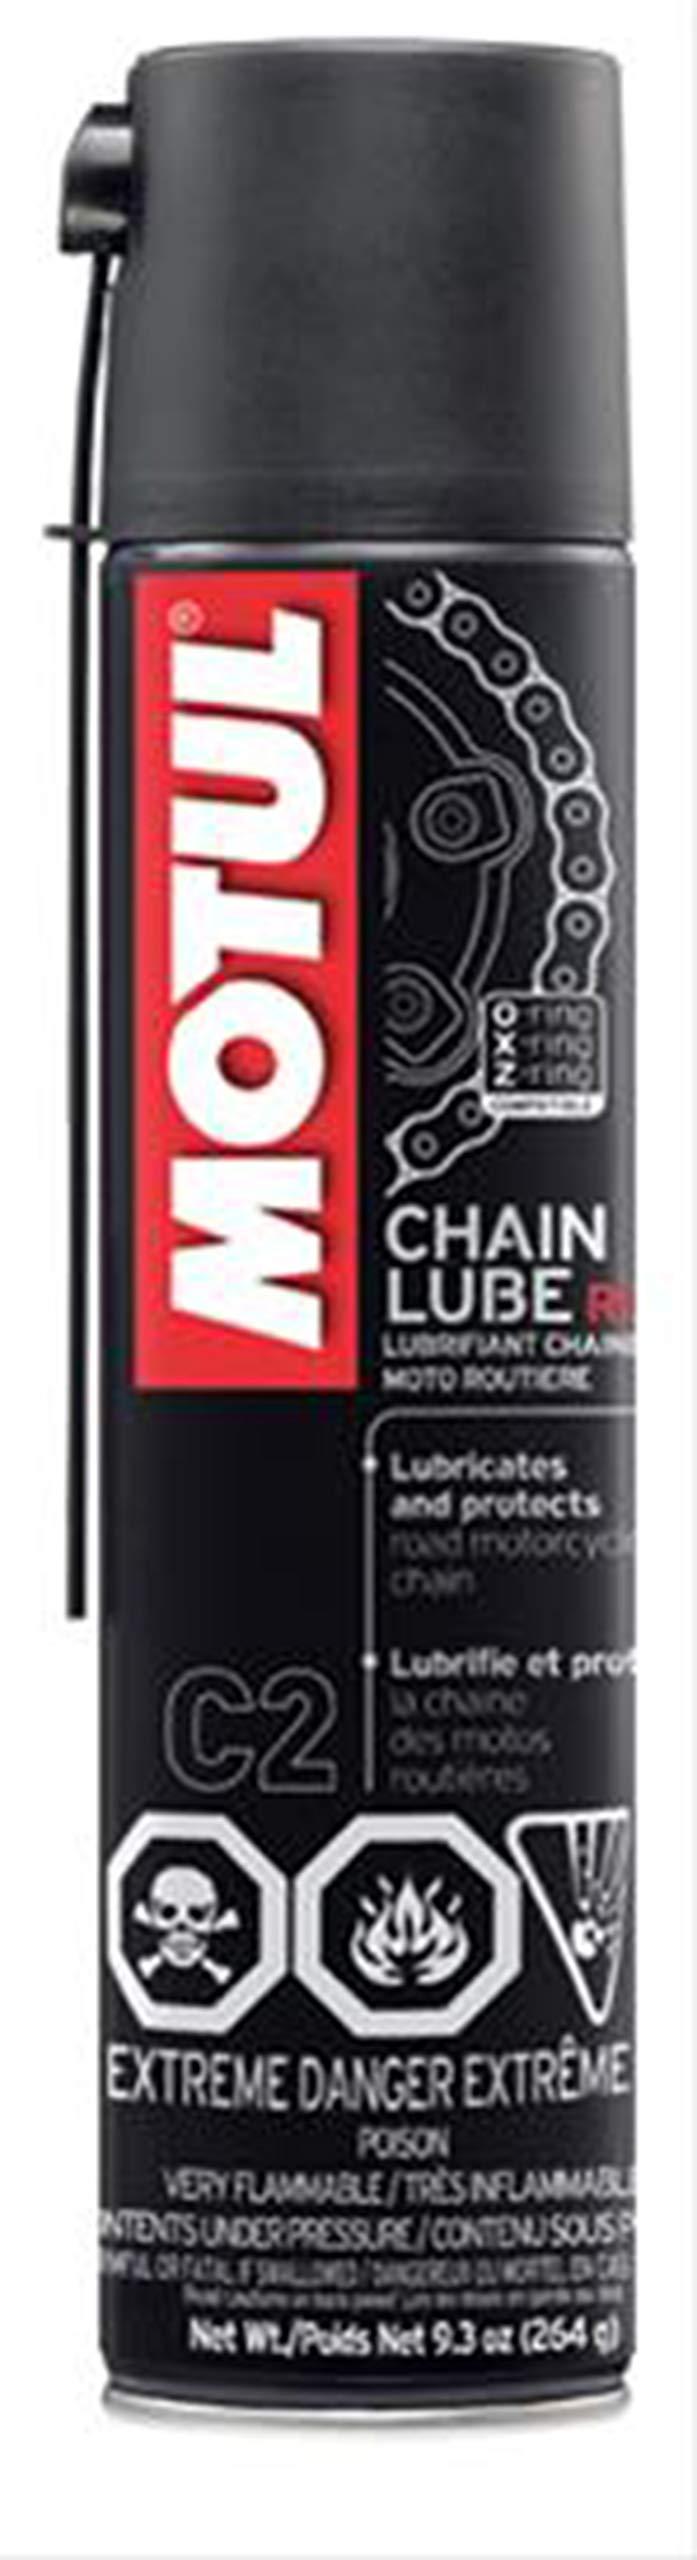 Motul C2 On Road Chain Lube 103244 M/C Care, 9.3oz, 9.3 Fluid_Ounces product image